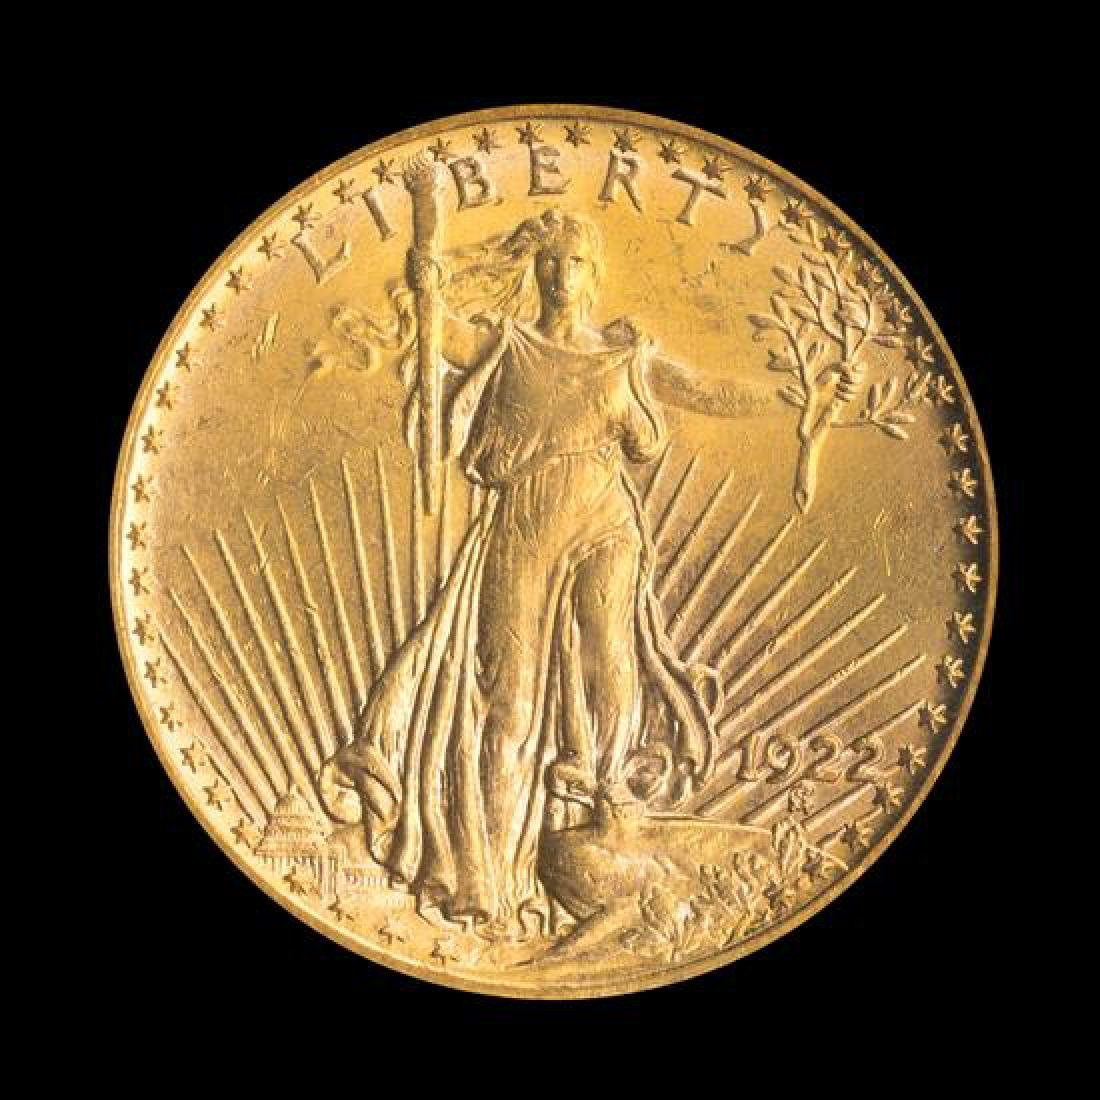 A United States 1922 Saint-Gaudens $20 Gold Coin